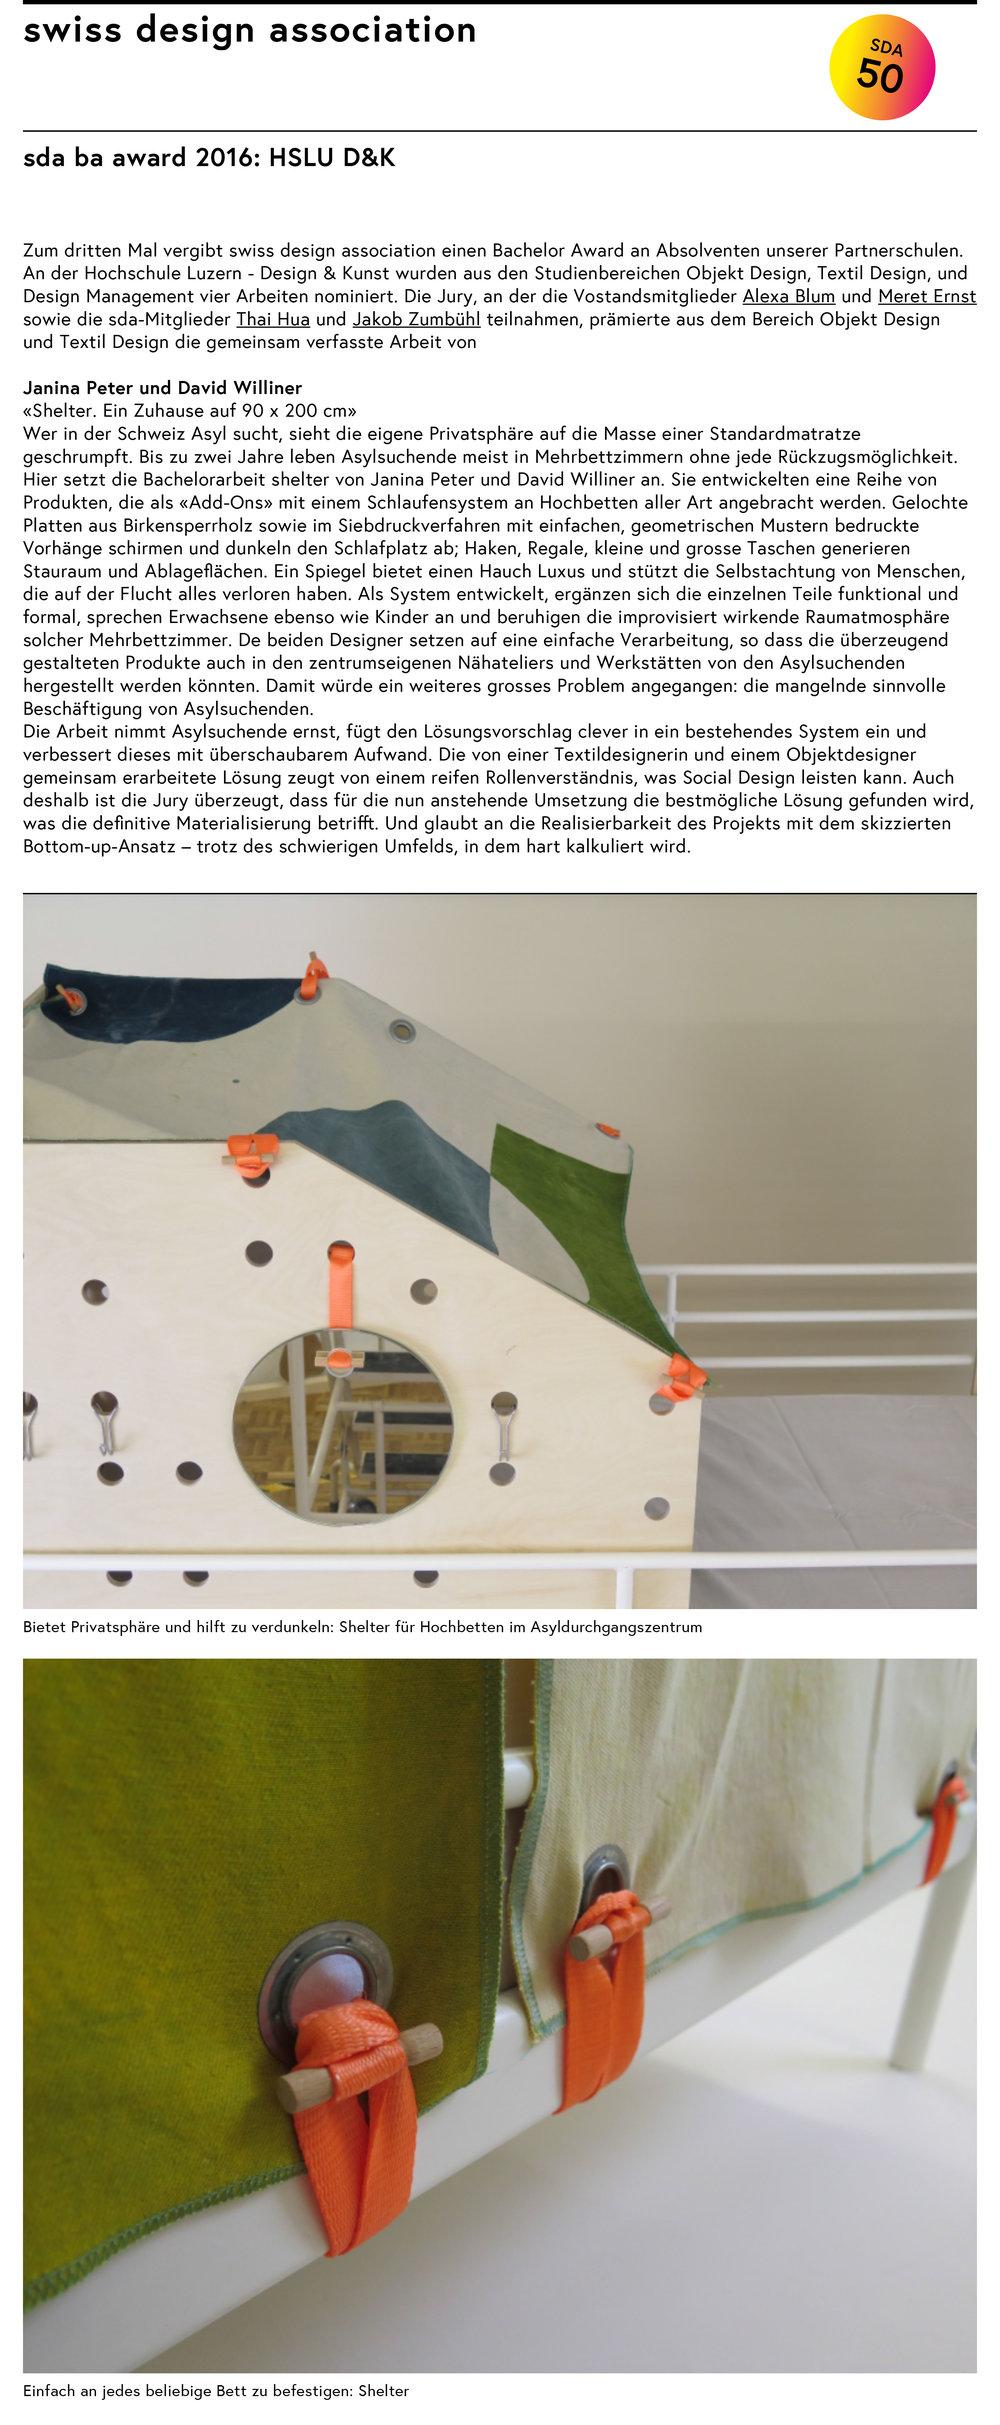 Ba Design Award Winner 2016 Swiss Design Associaton Social Design